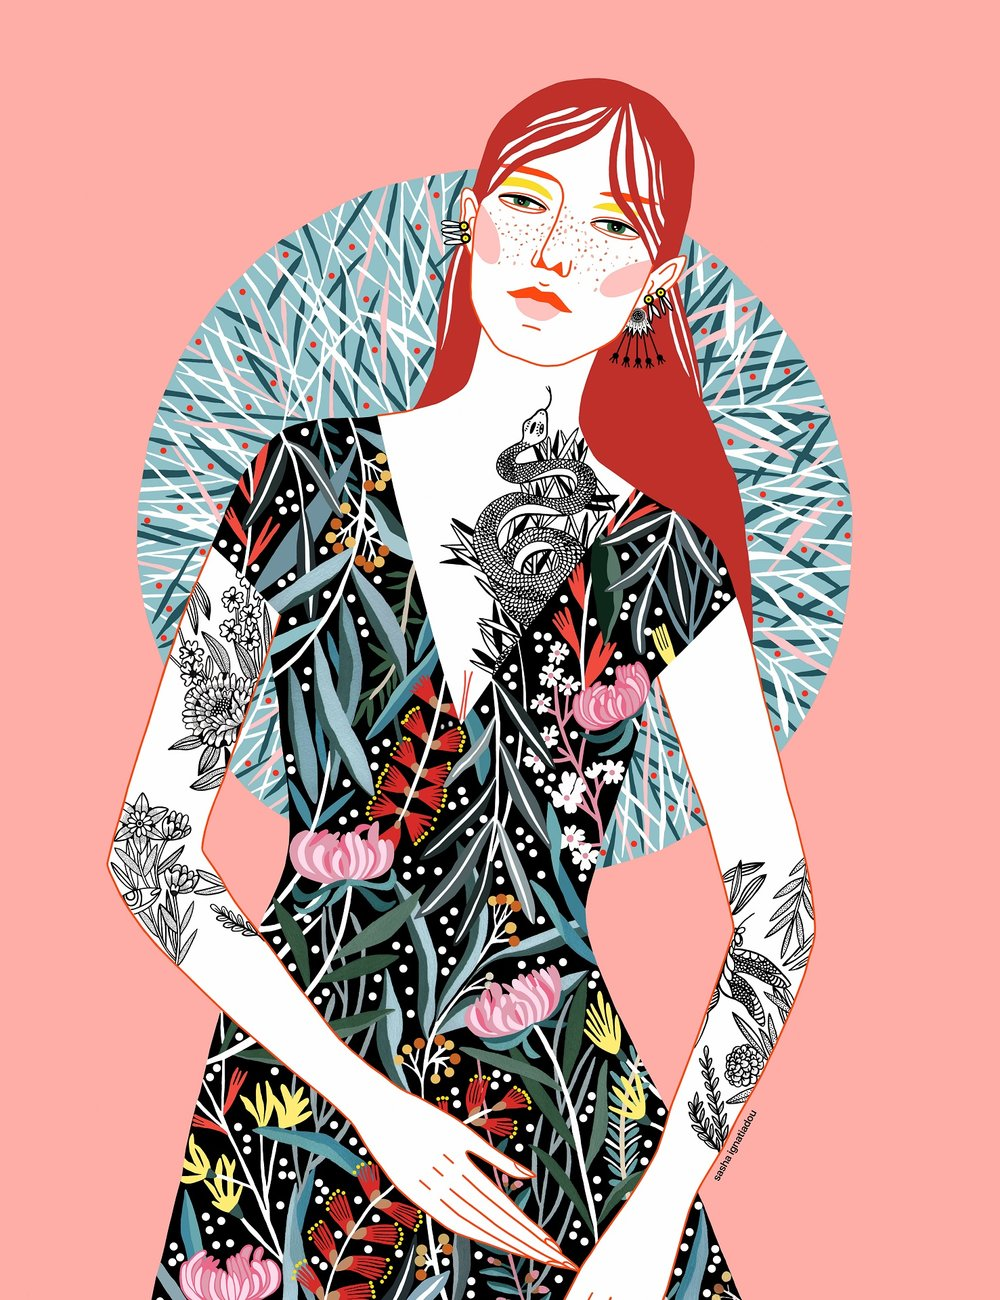 redheadgirl - .jpg